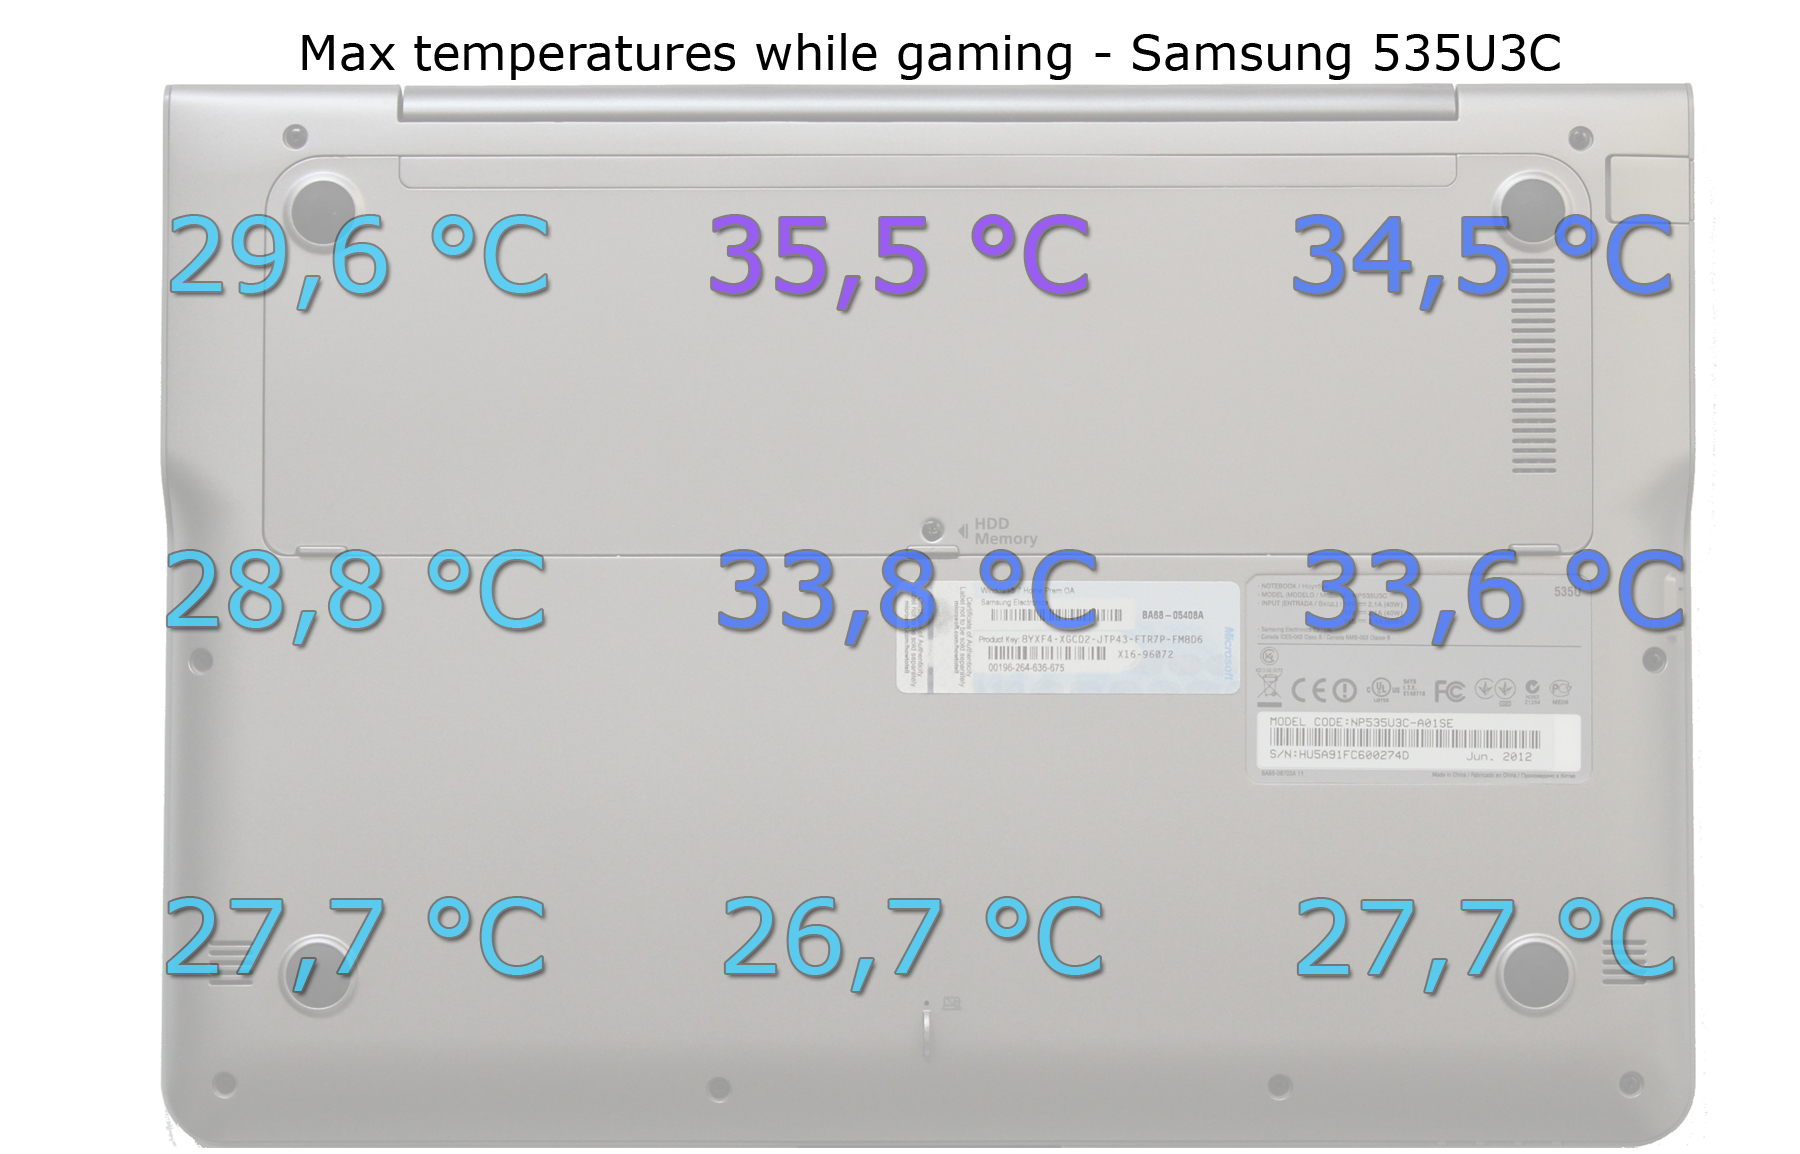 Samsung_535U3C_Temp4